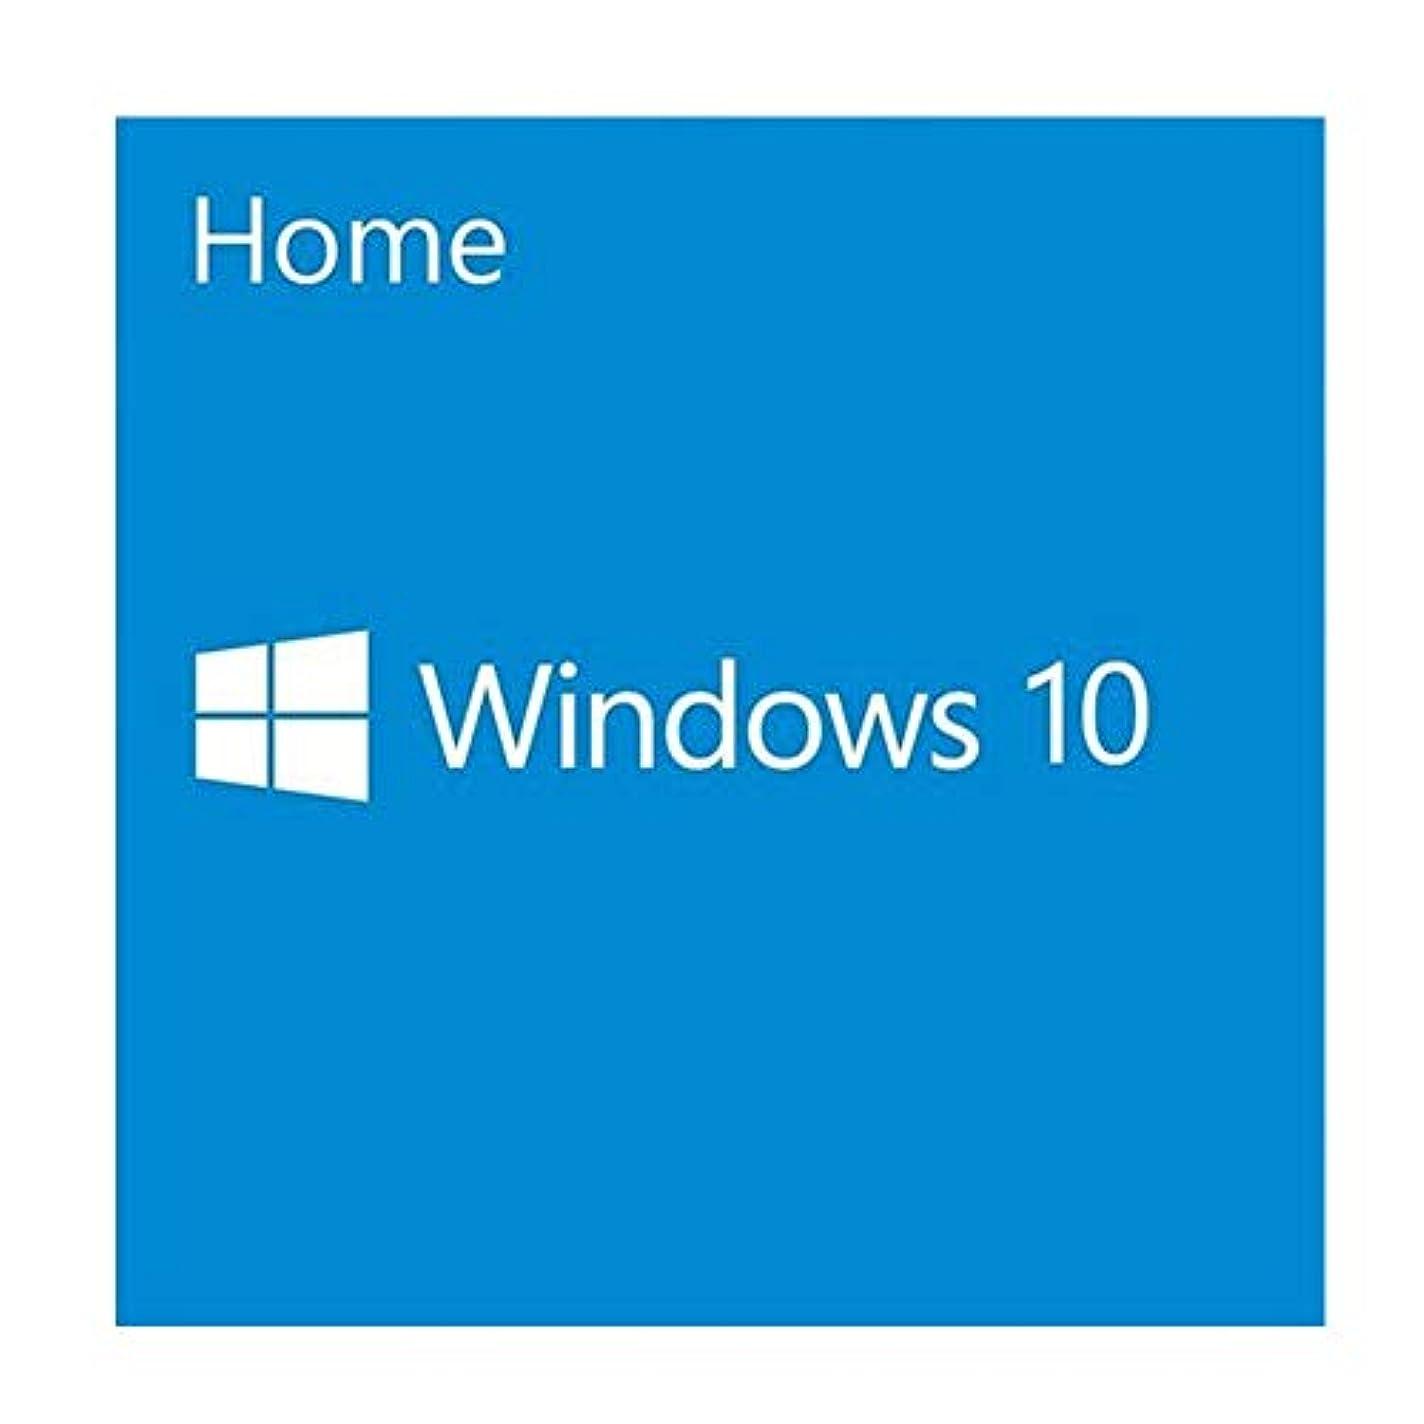 Windows 10 Home 1PC ダウンロード版 日本語正規 32bit/64bit プロダクトキー インストール完了までサポート オンライン認証保証